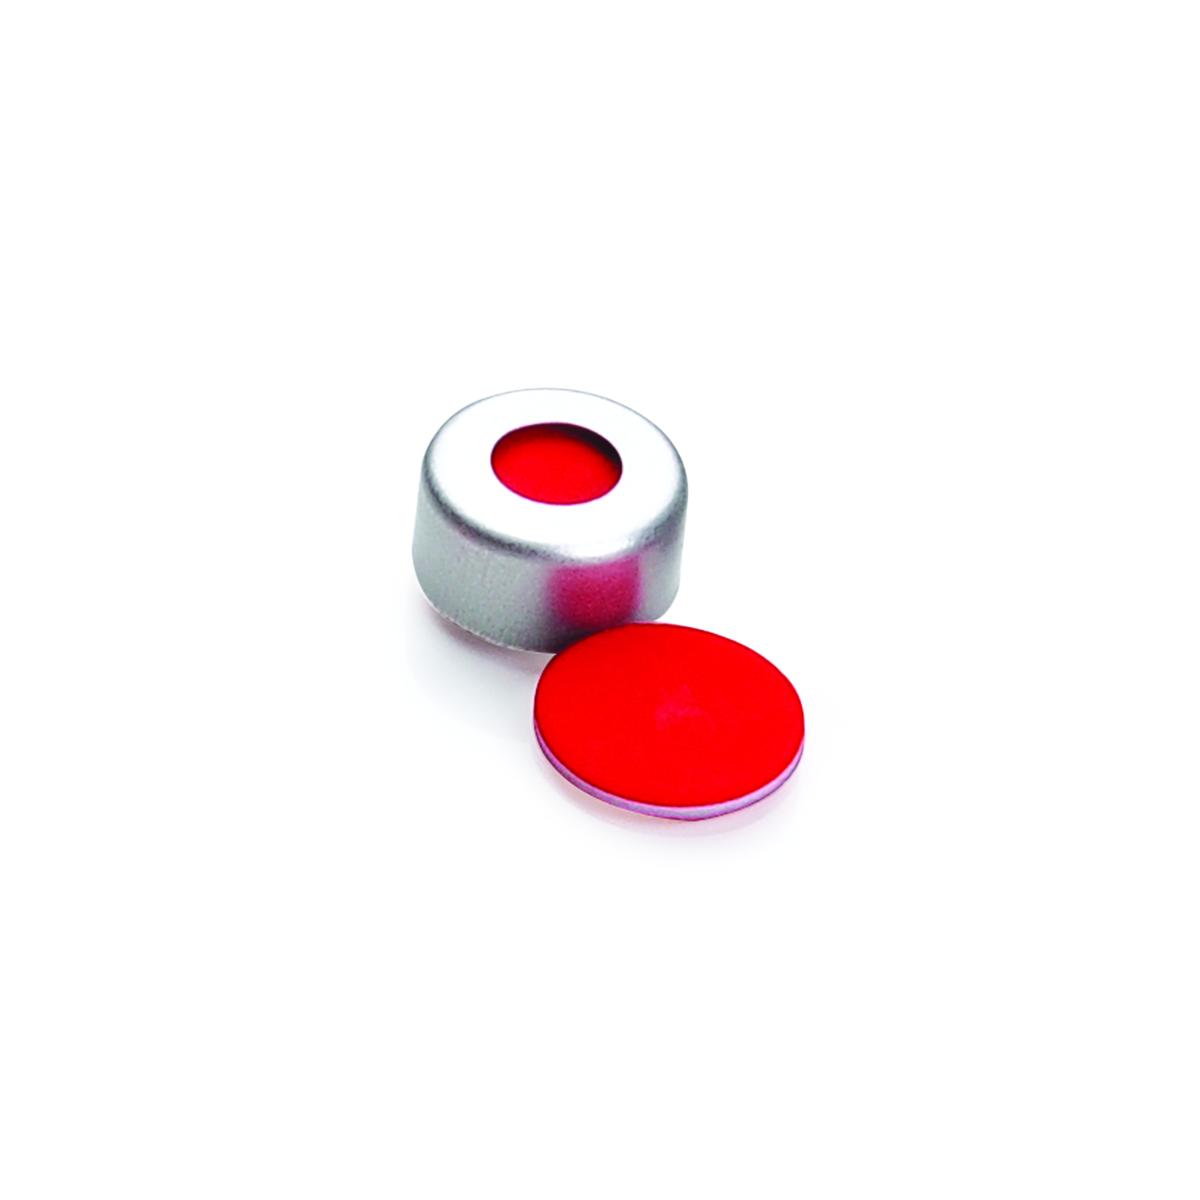 WHEATON® µL MicroLiter® 11 mm Crimp Seals With Septa, PTFE/Silicone/PTFE, Magnetic